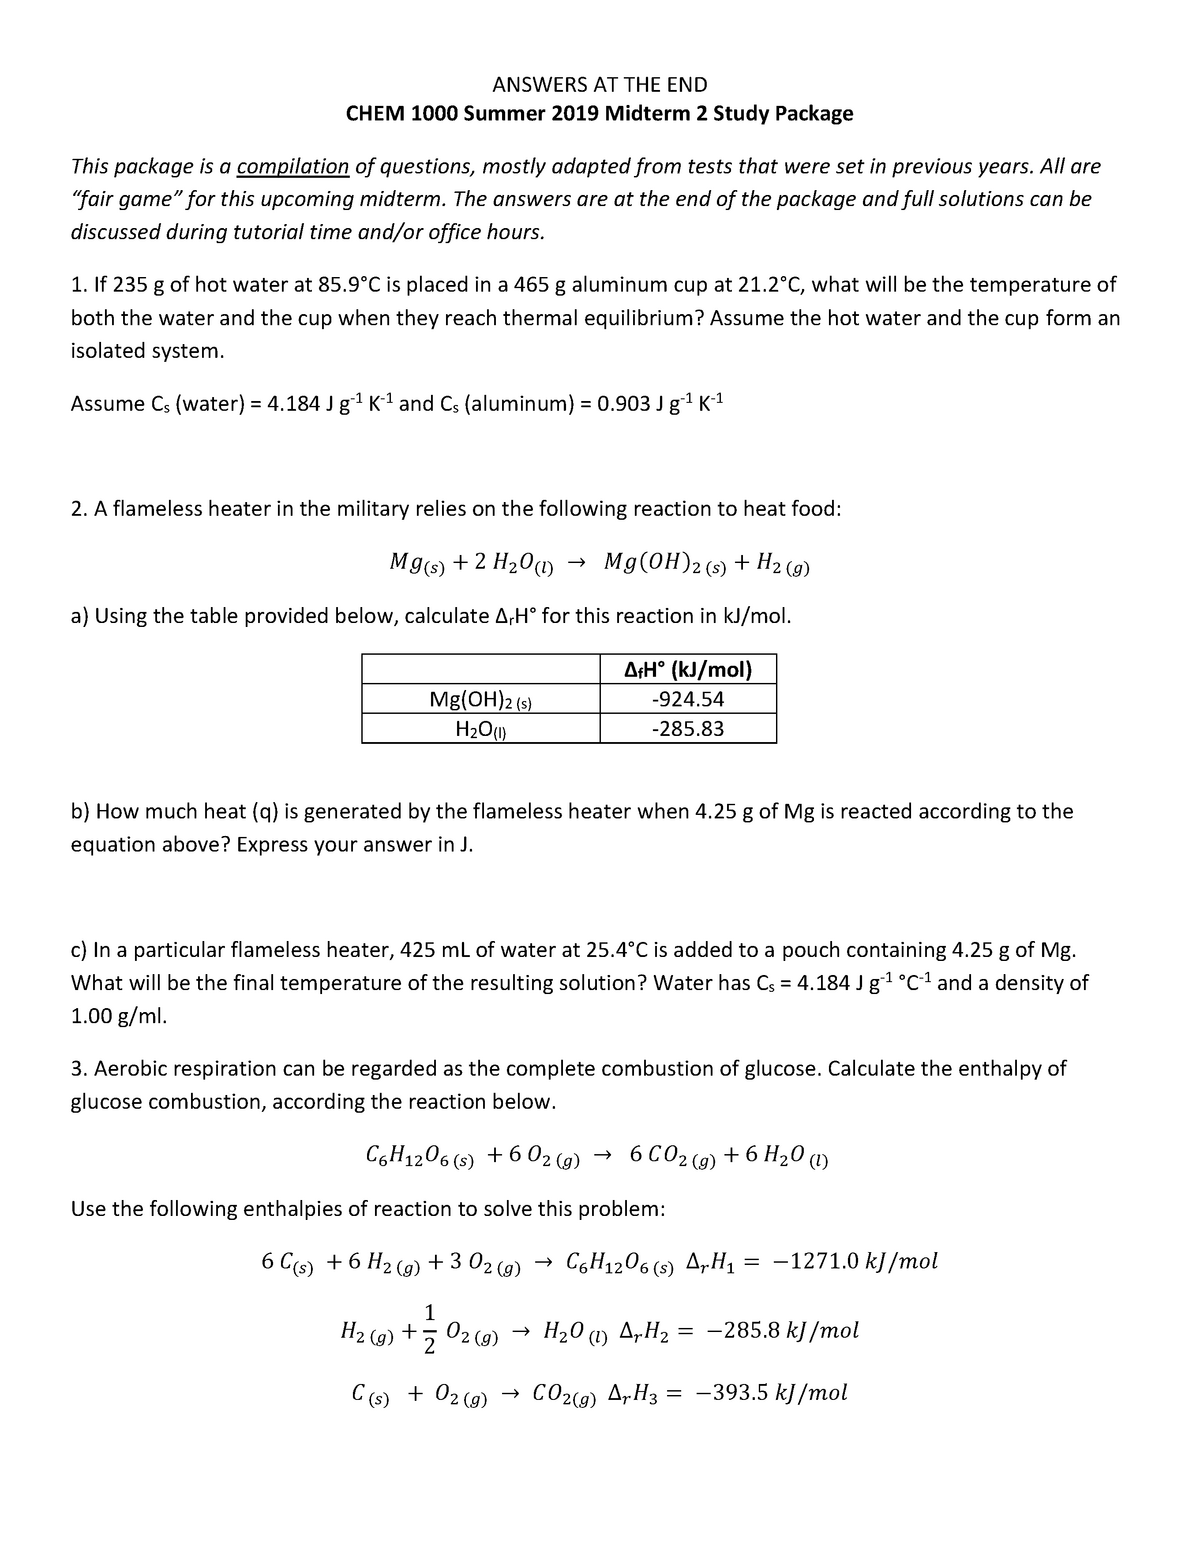 CHEM1000 SU2019 Midterm 2studypackage - Sc/Chem 1000